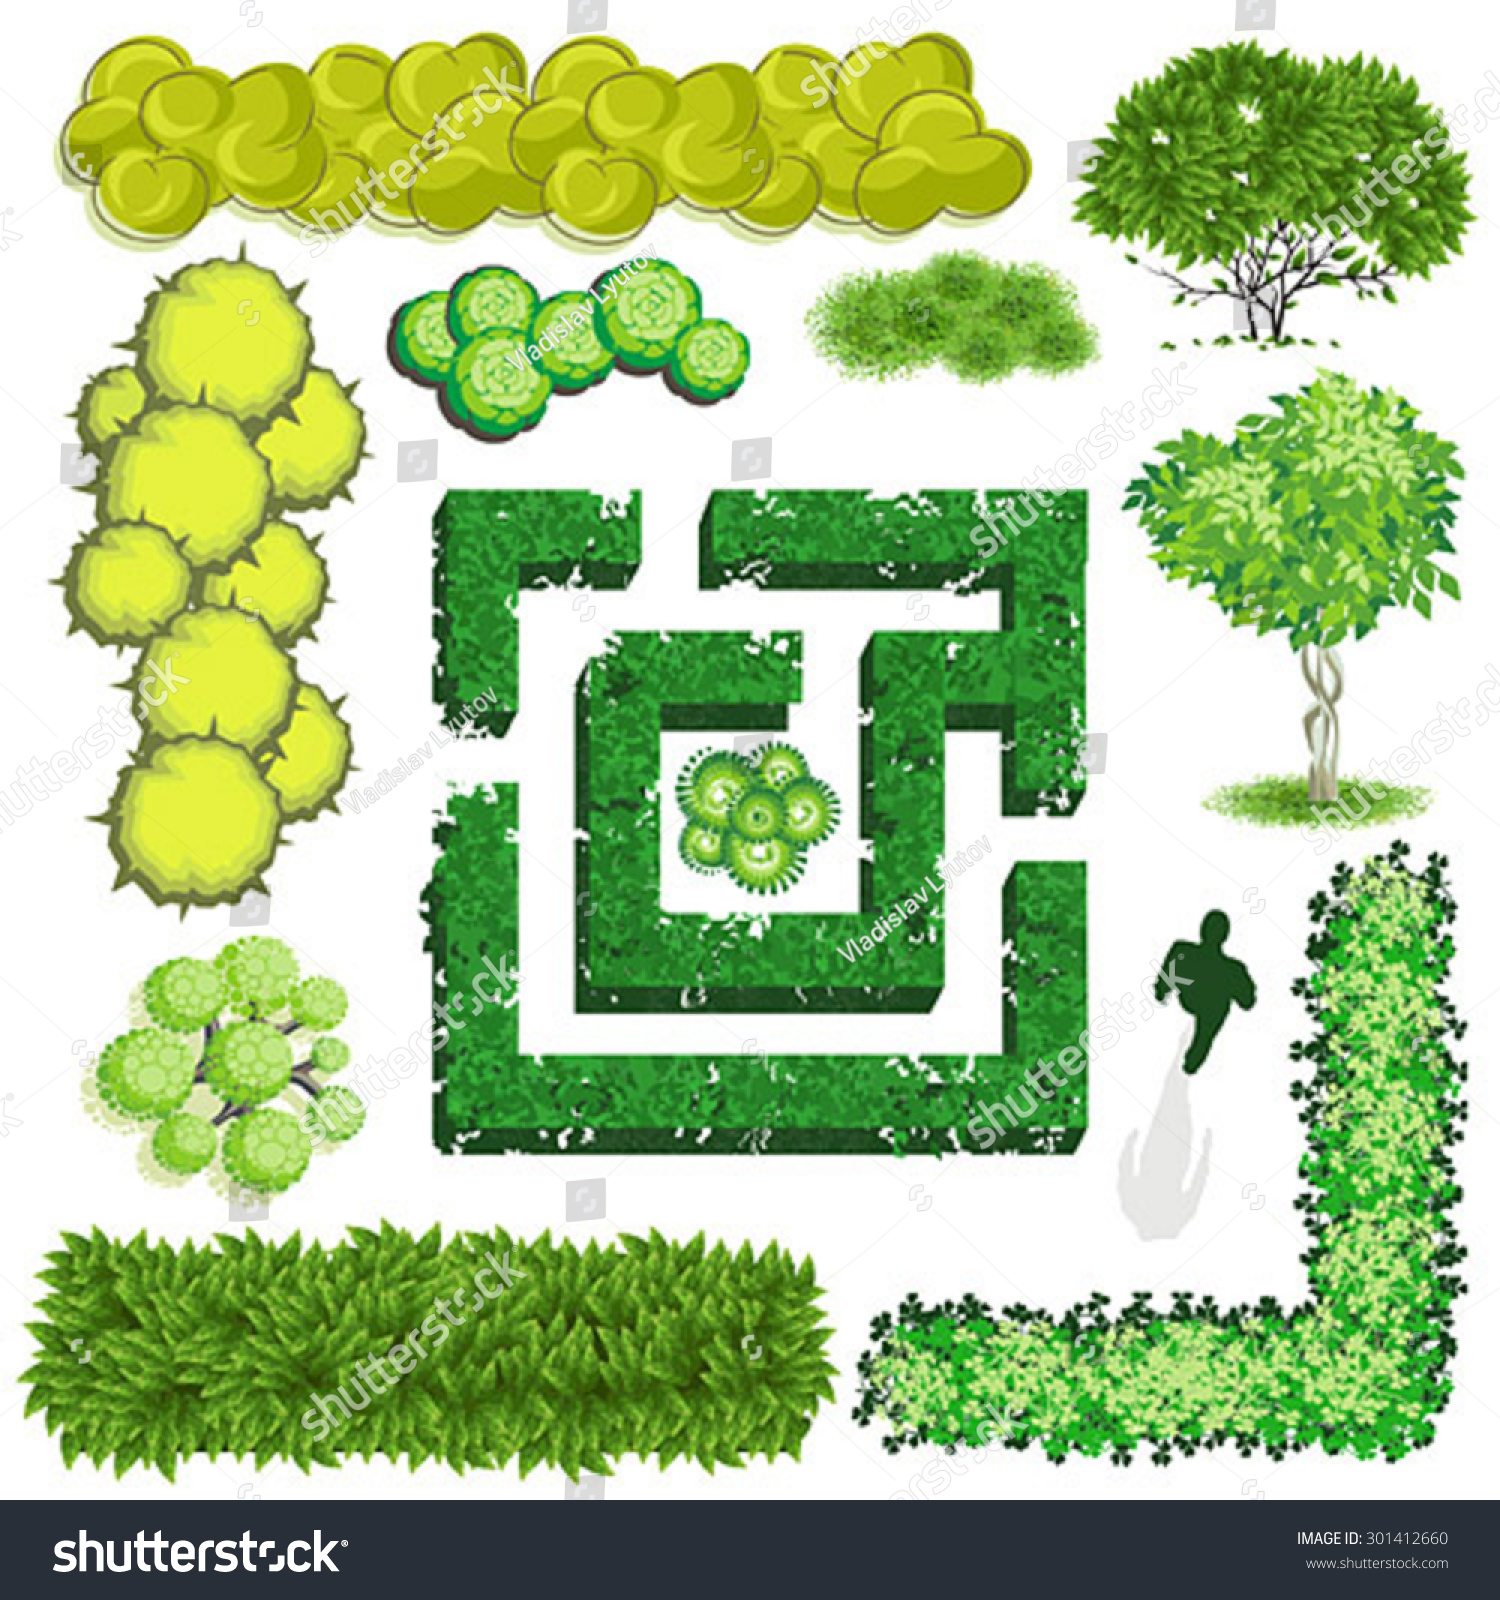 Trees Bush Item Top View Landscape Stock Vector 301412660 ...